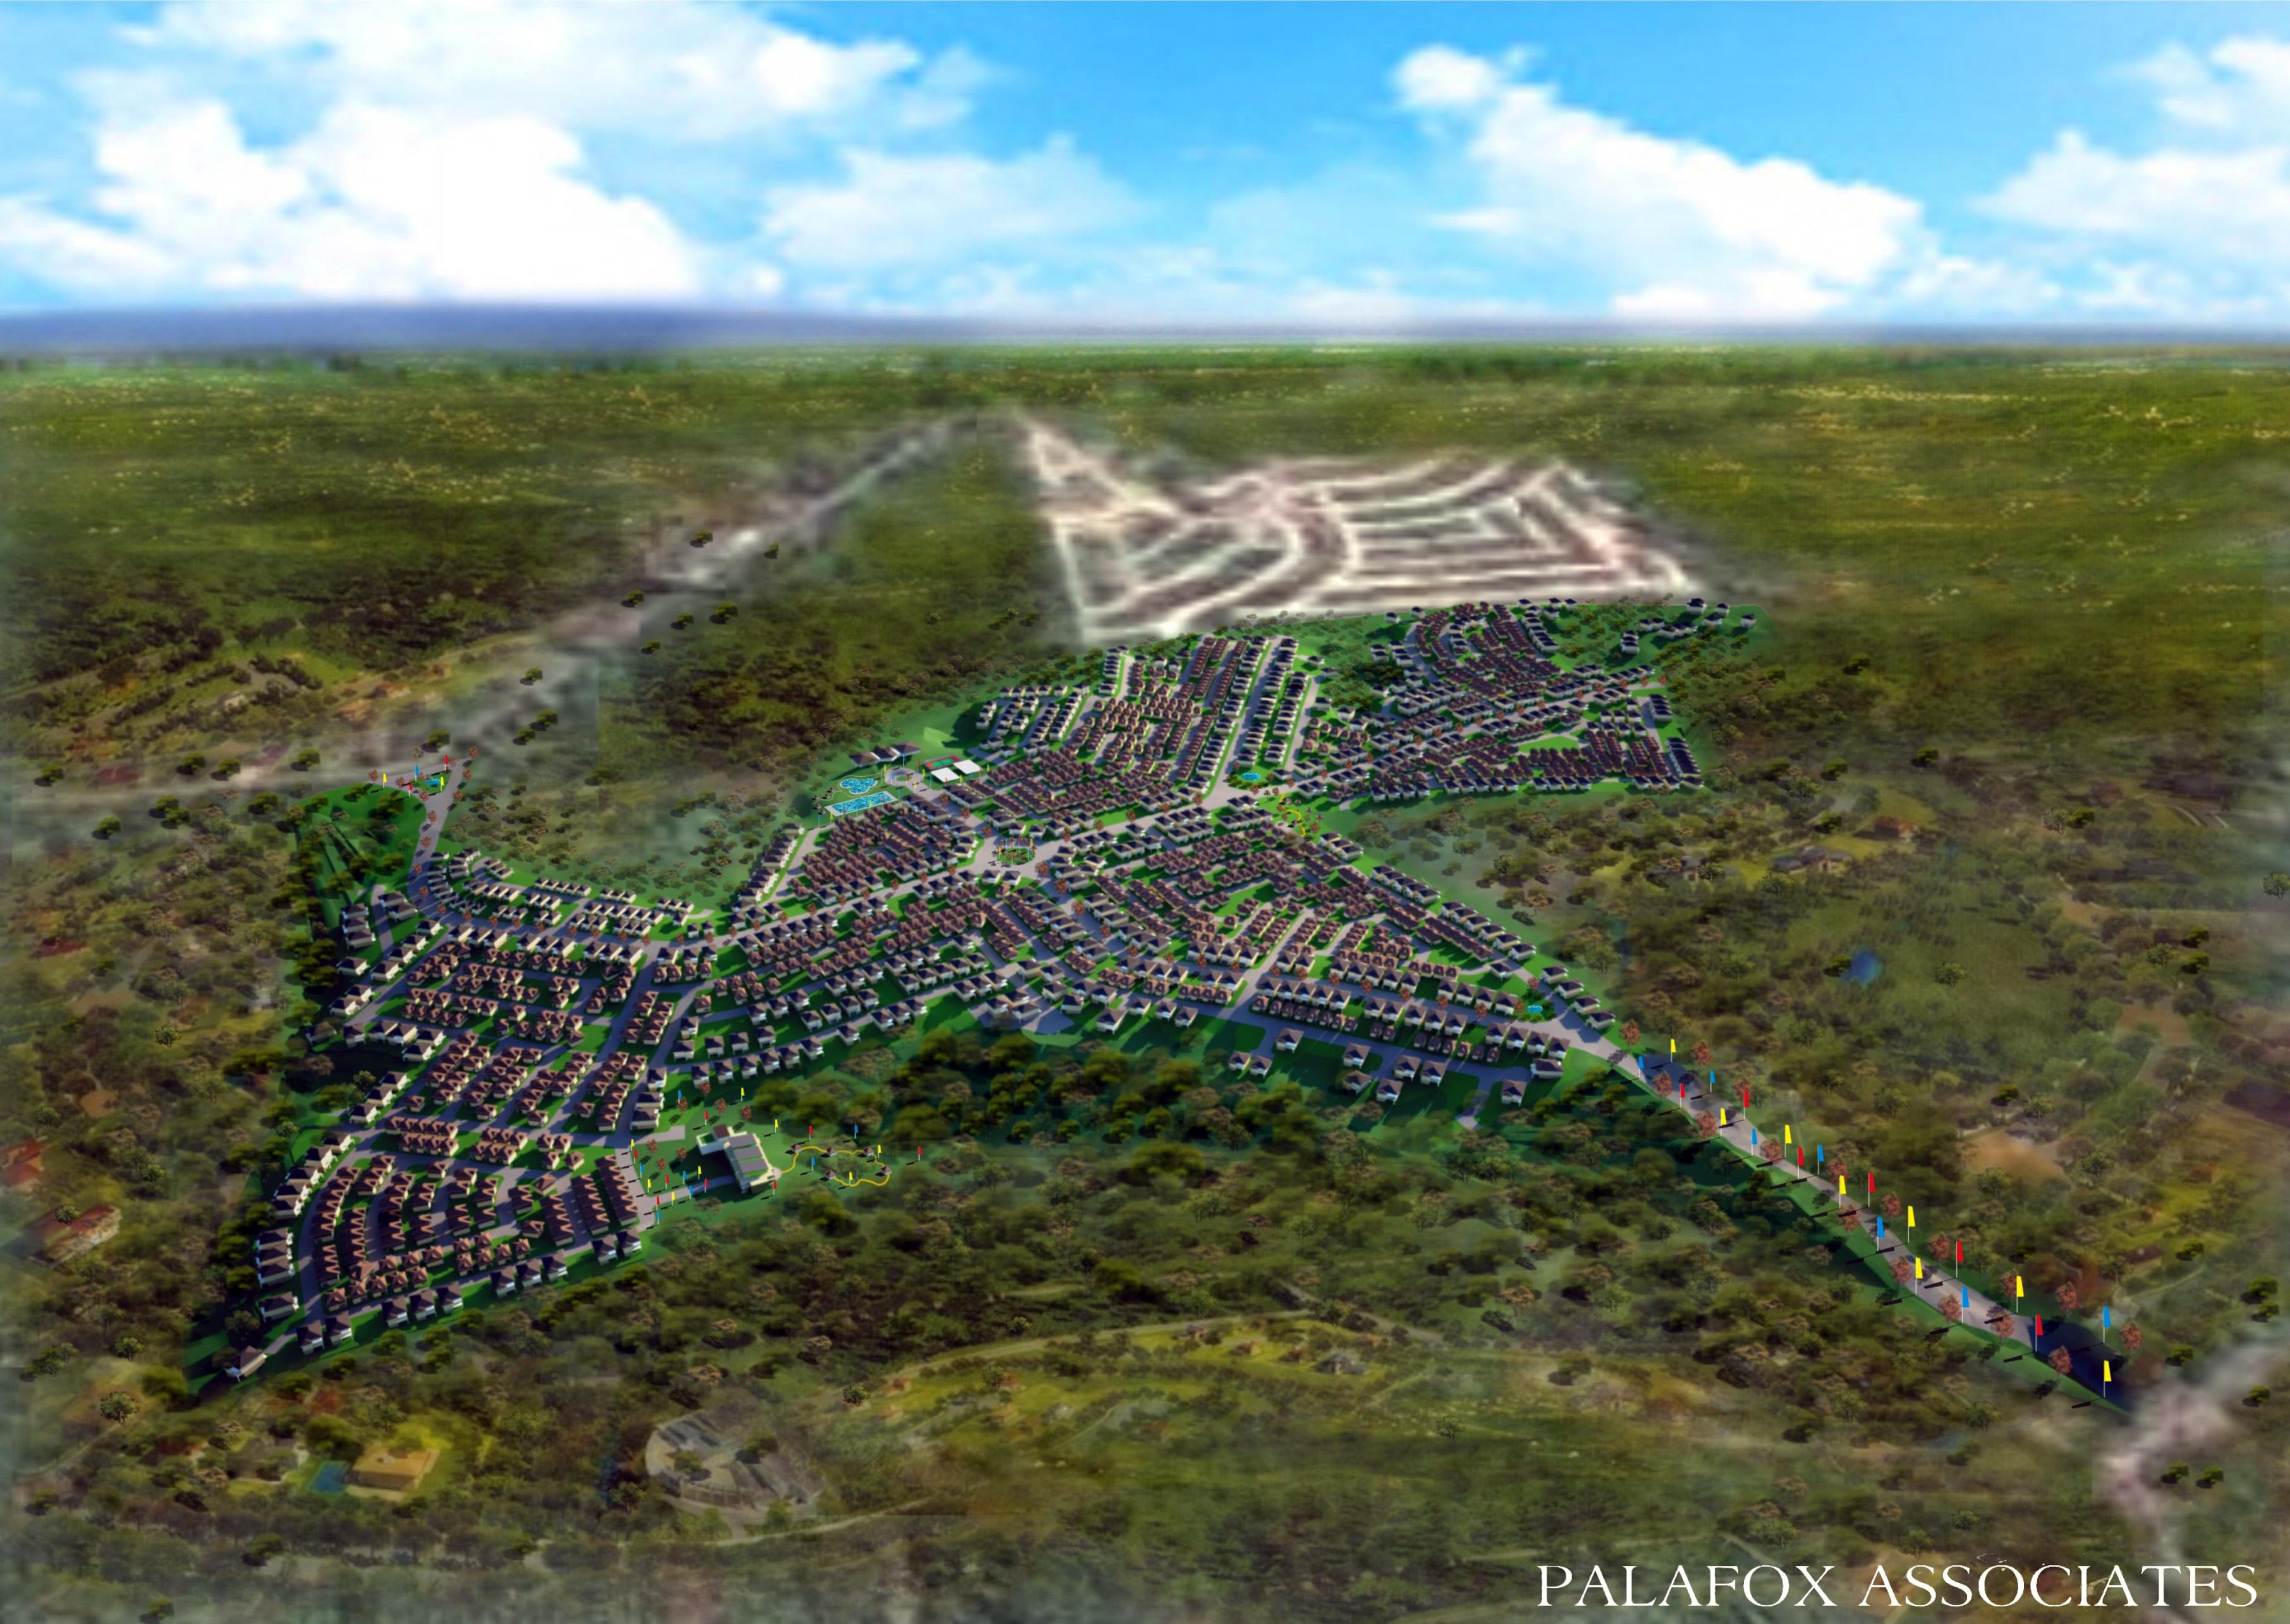 New mindset in urban planning